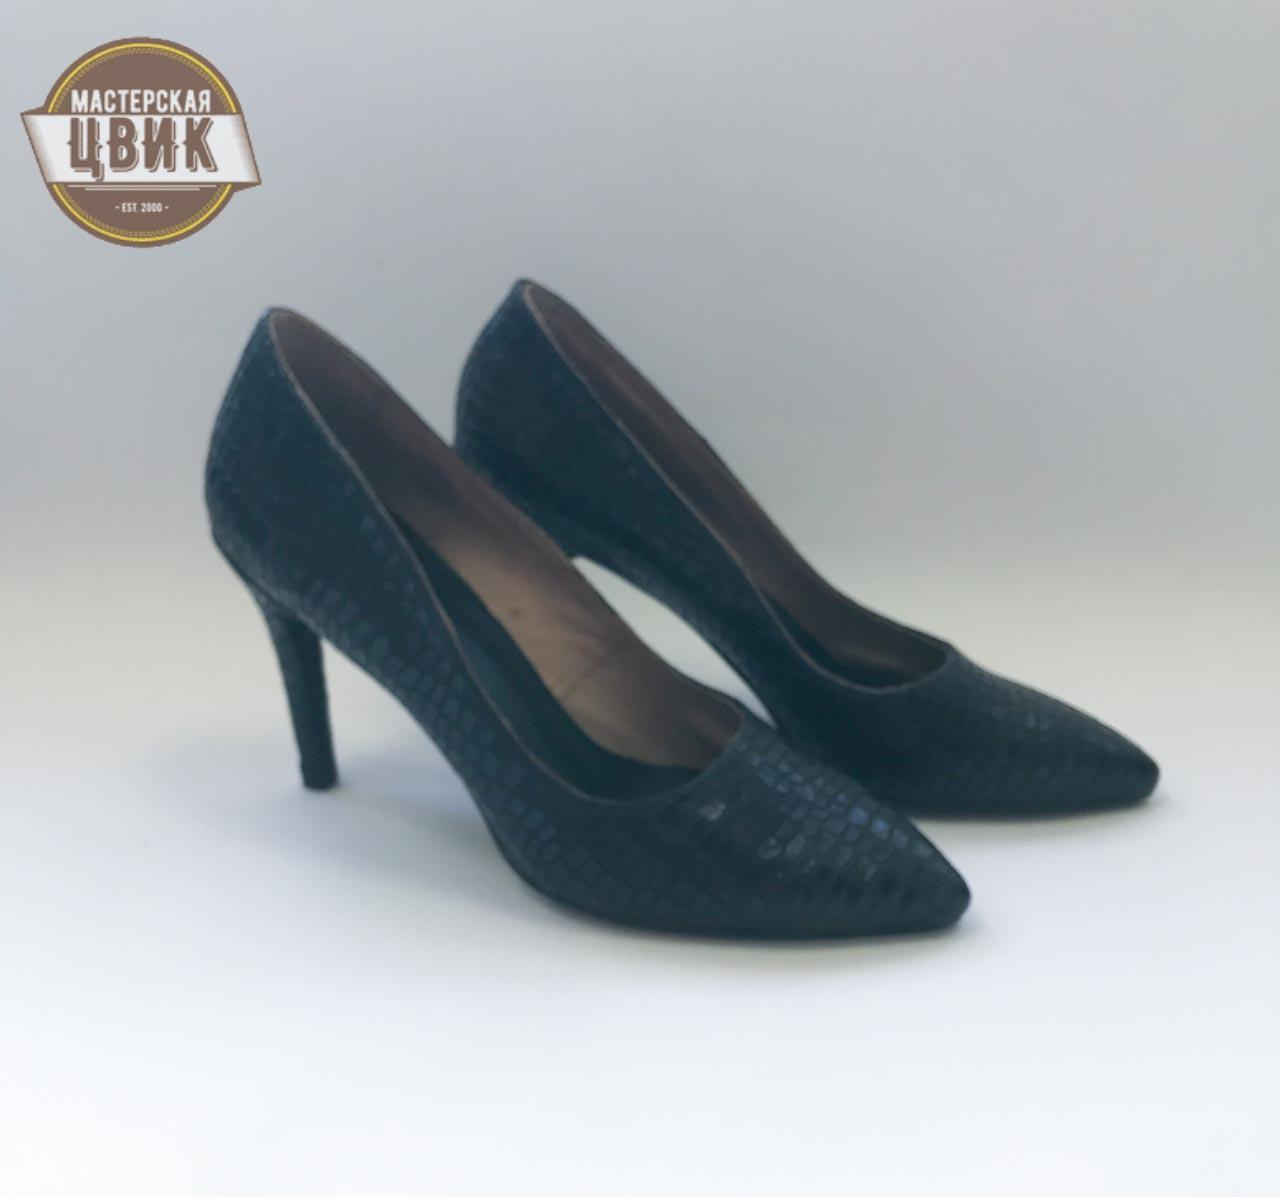 individualnyj-poshiv-obuvi-minsk-34 Индивидуальный пошив обуви